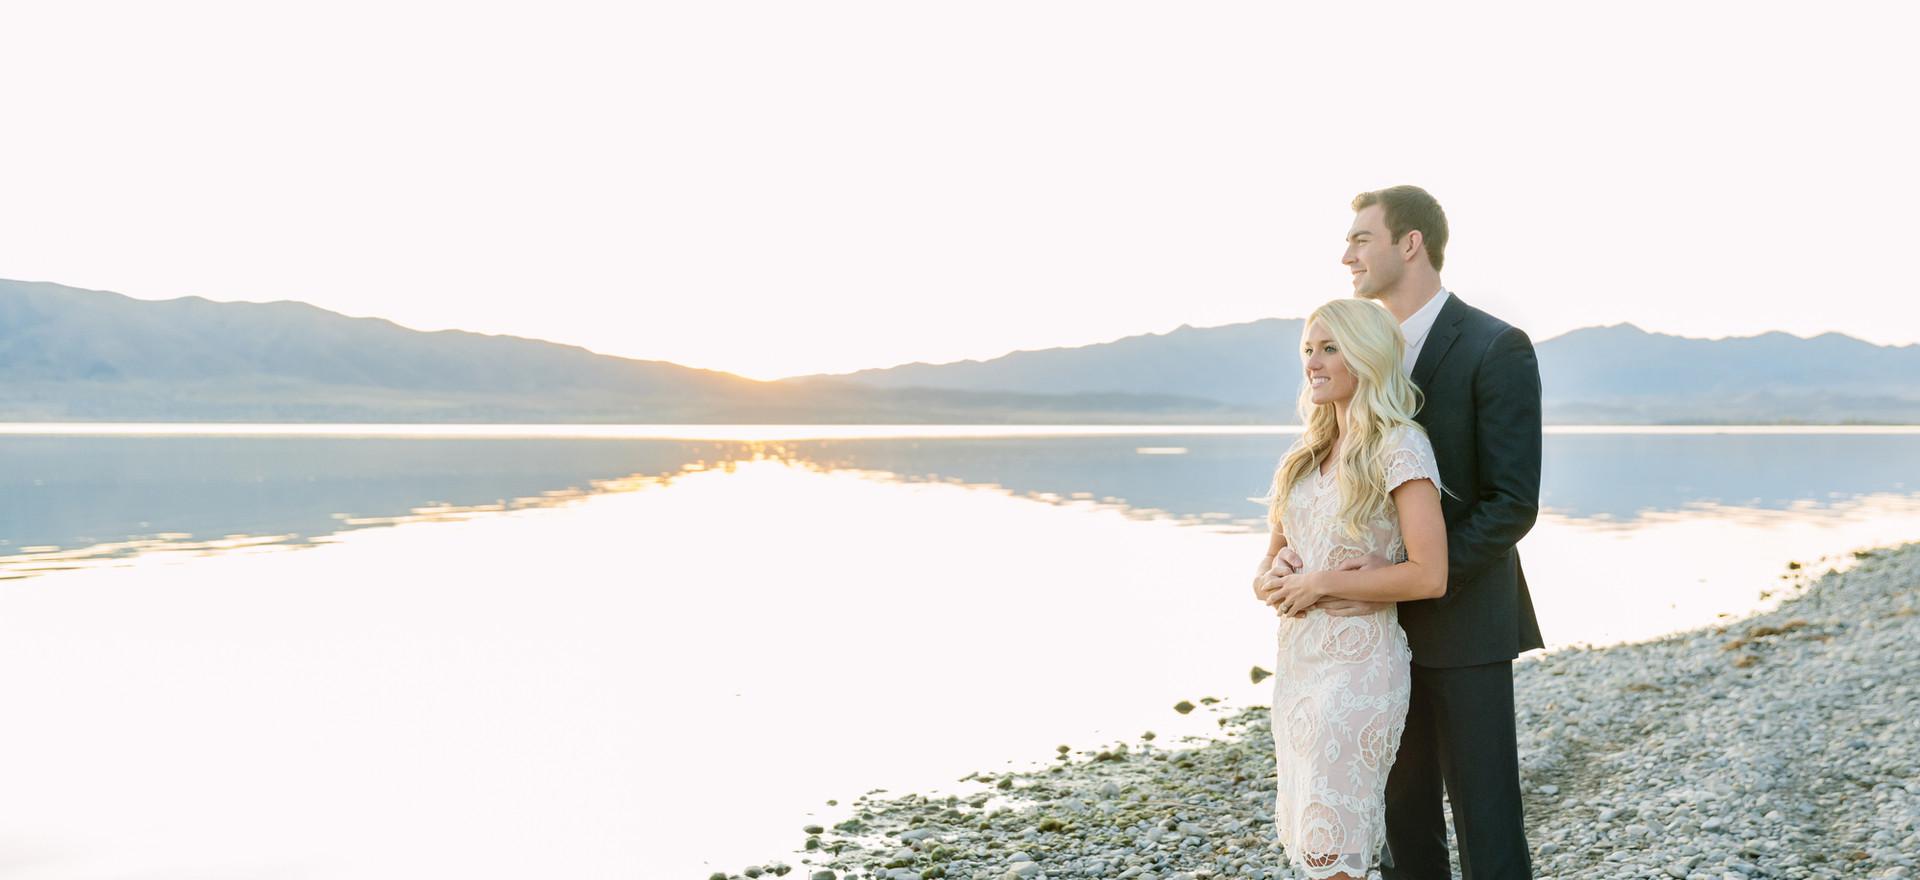 Utah Lake Engagement Photo